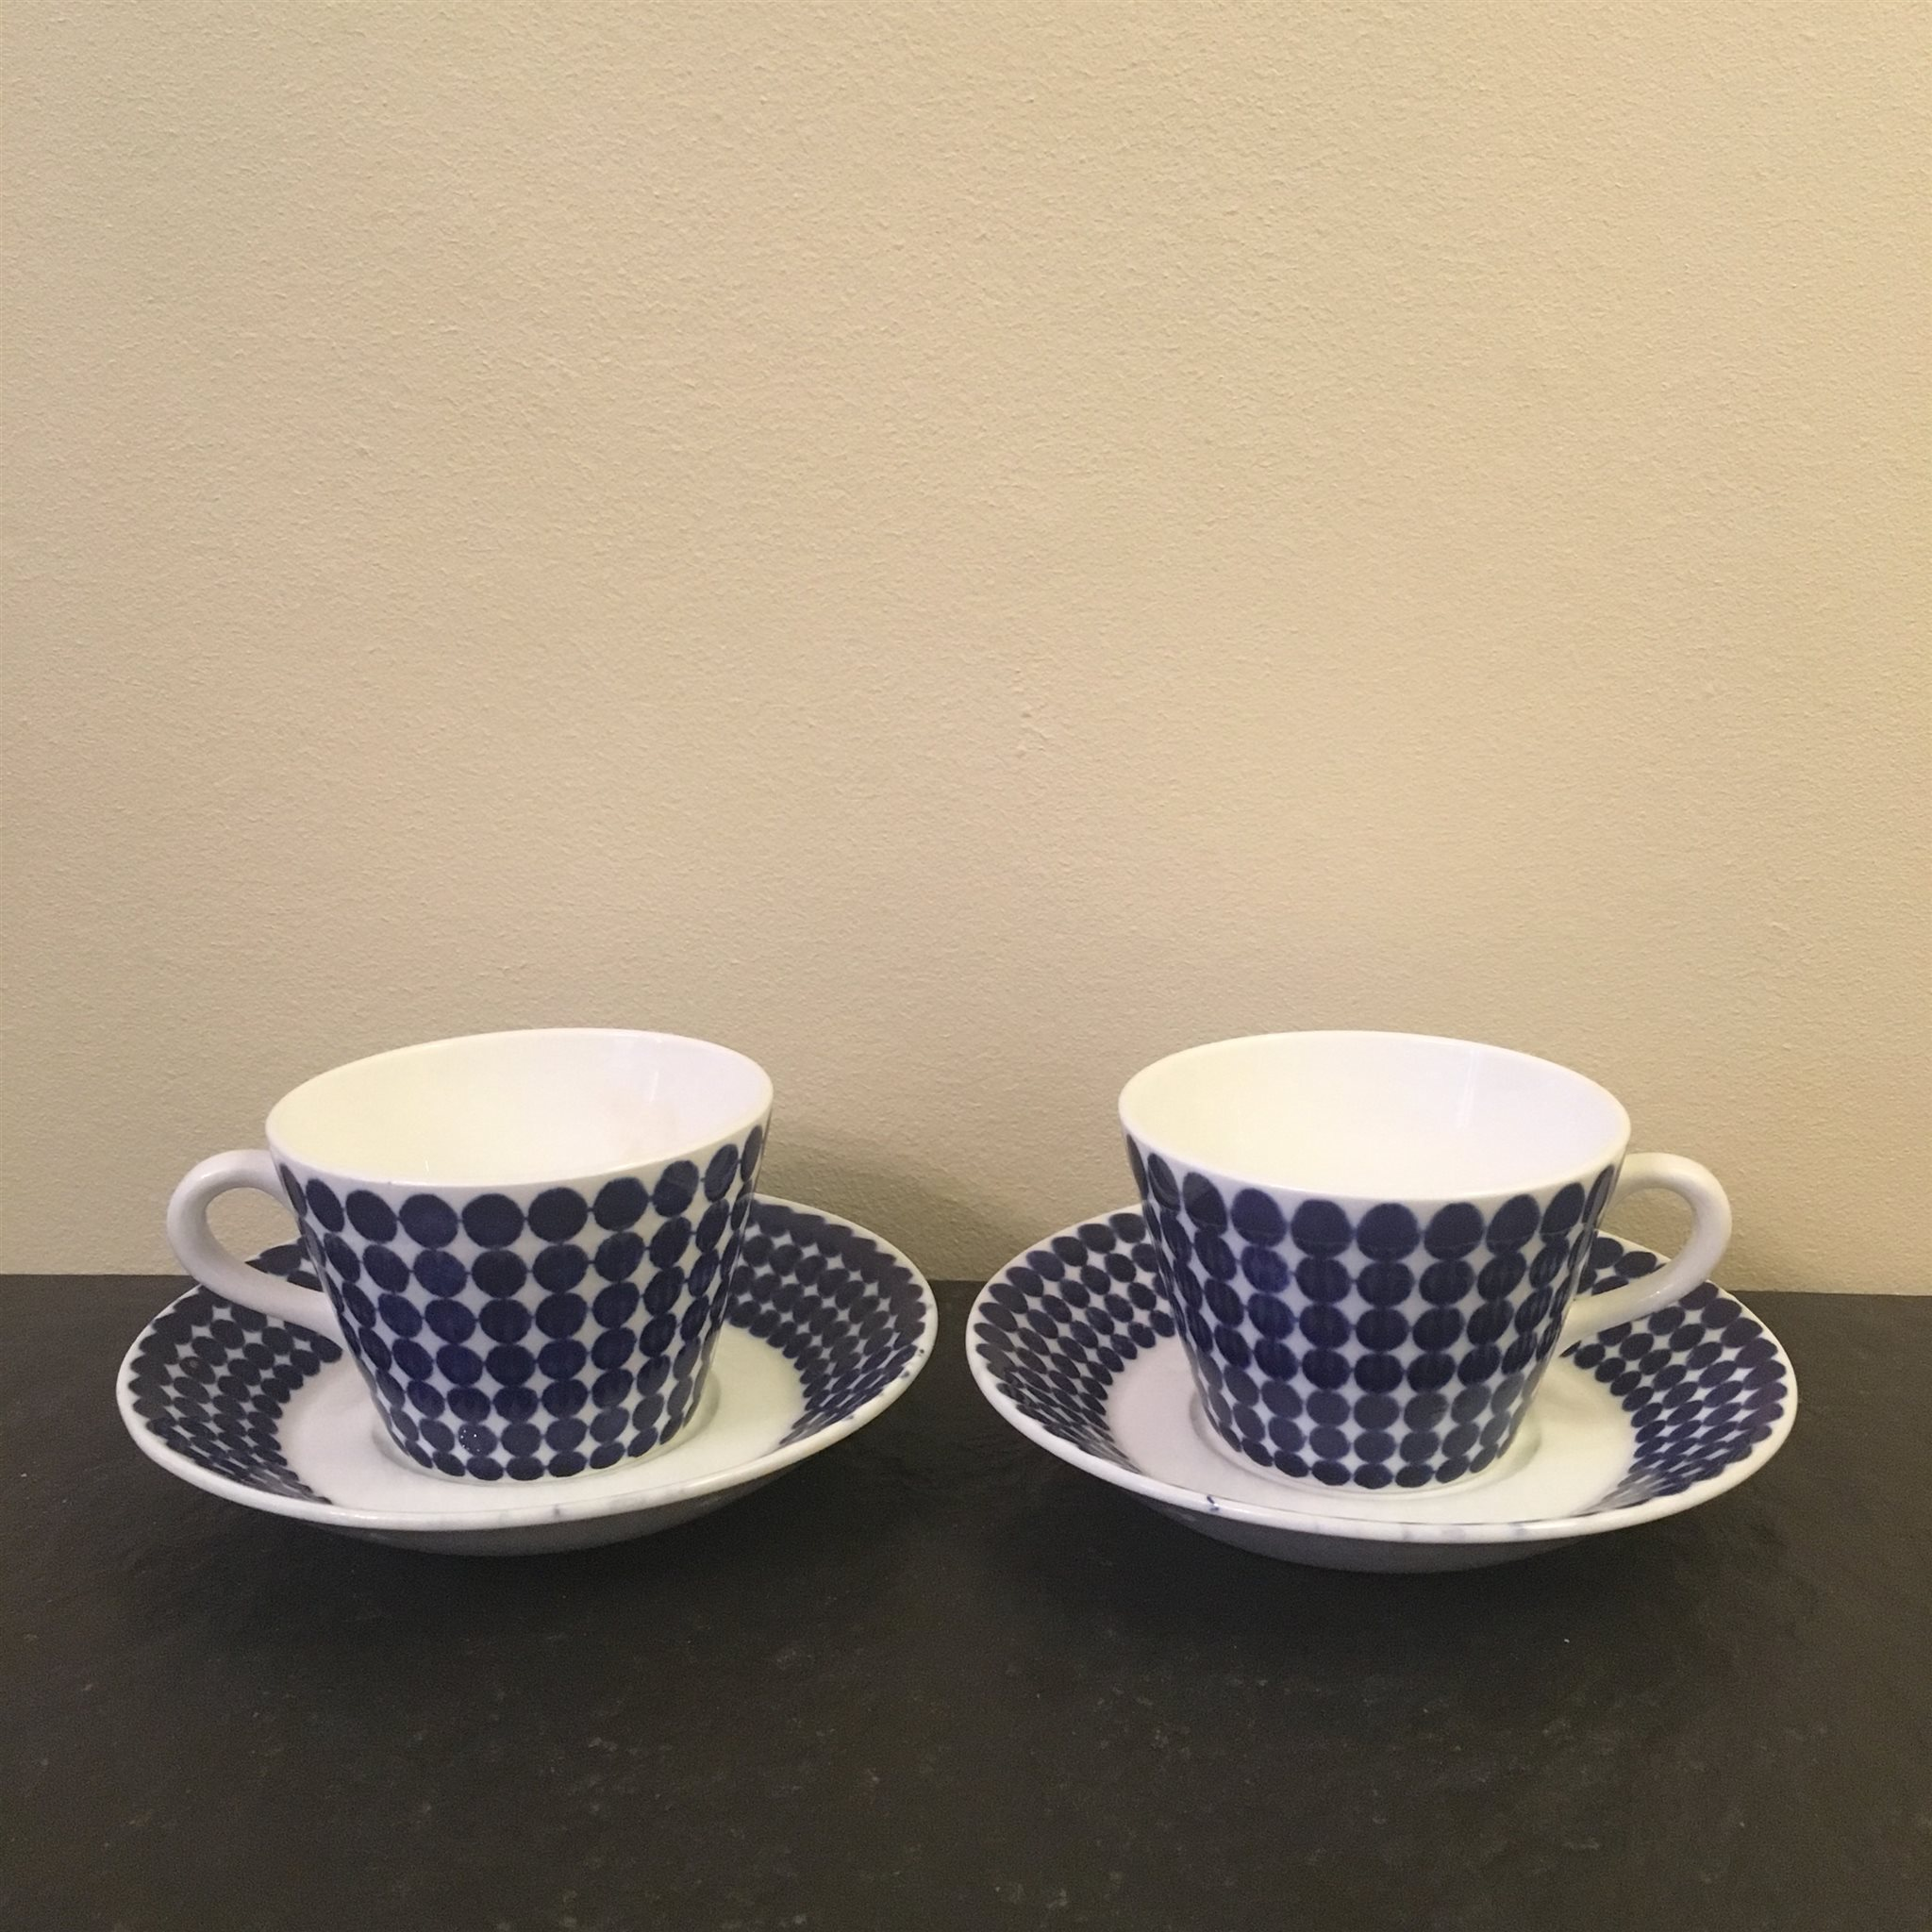 kaffekoppar från gustavsberg